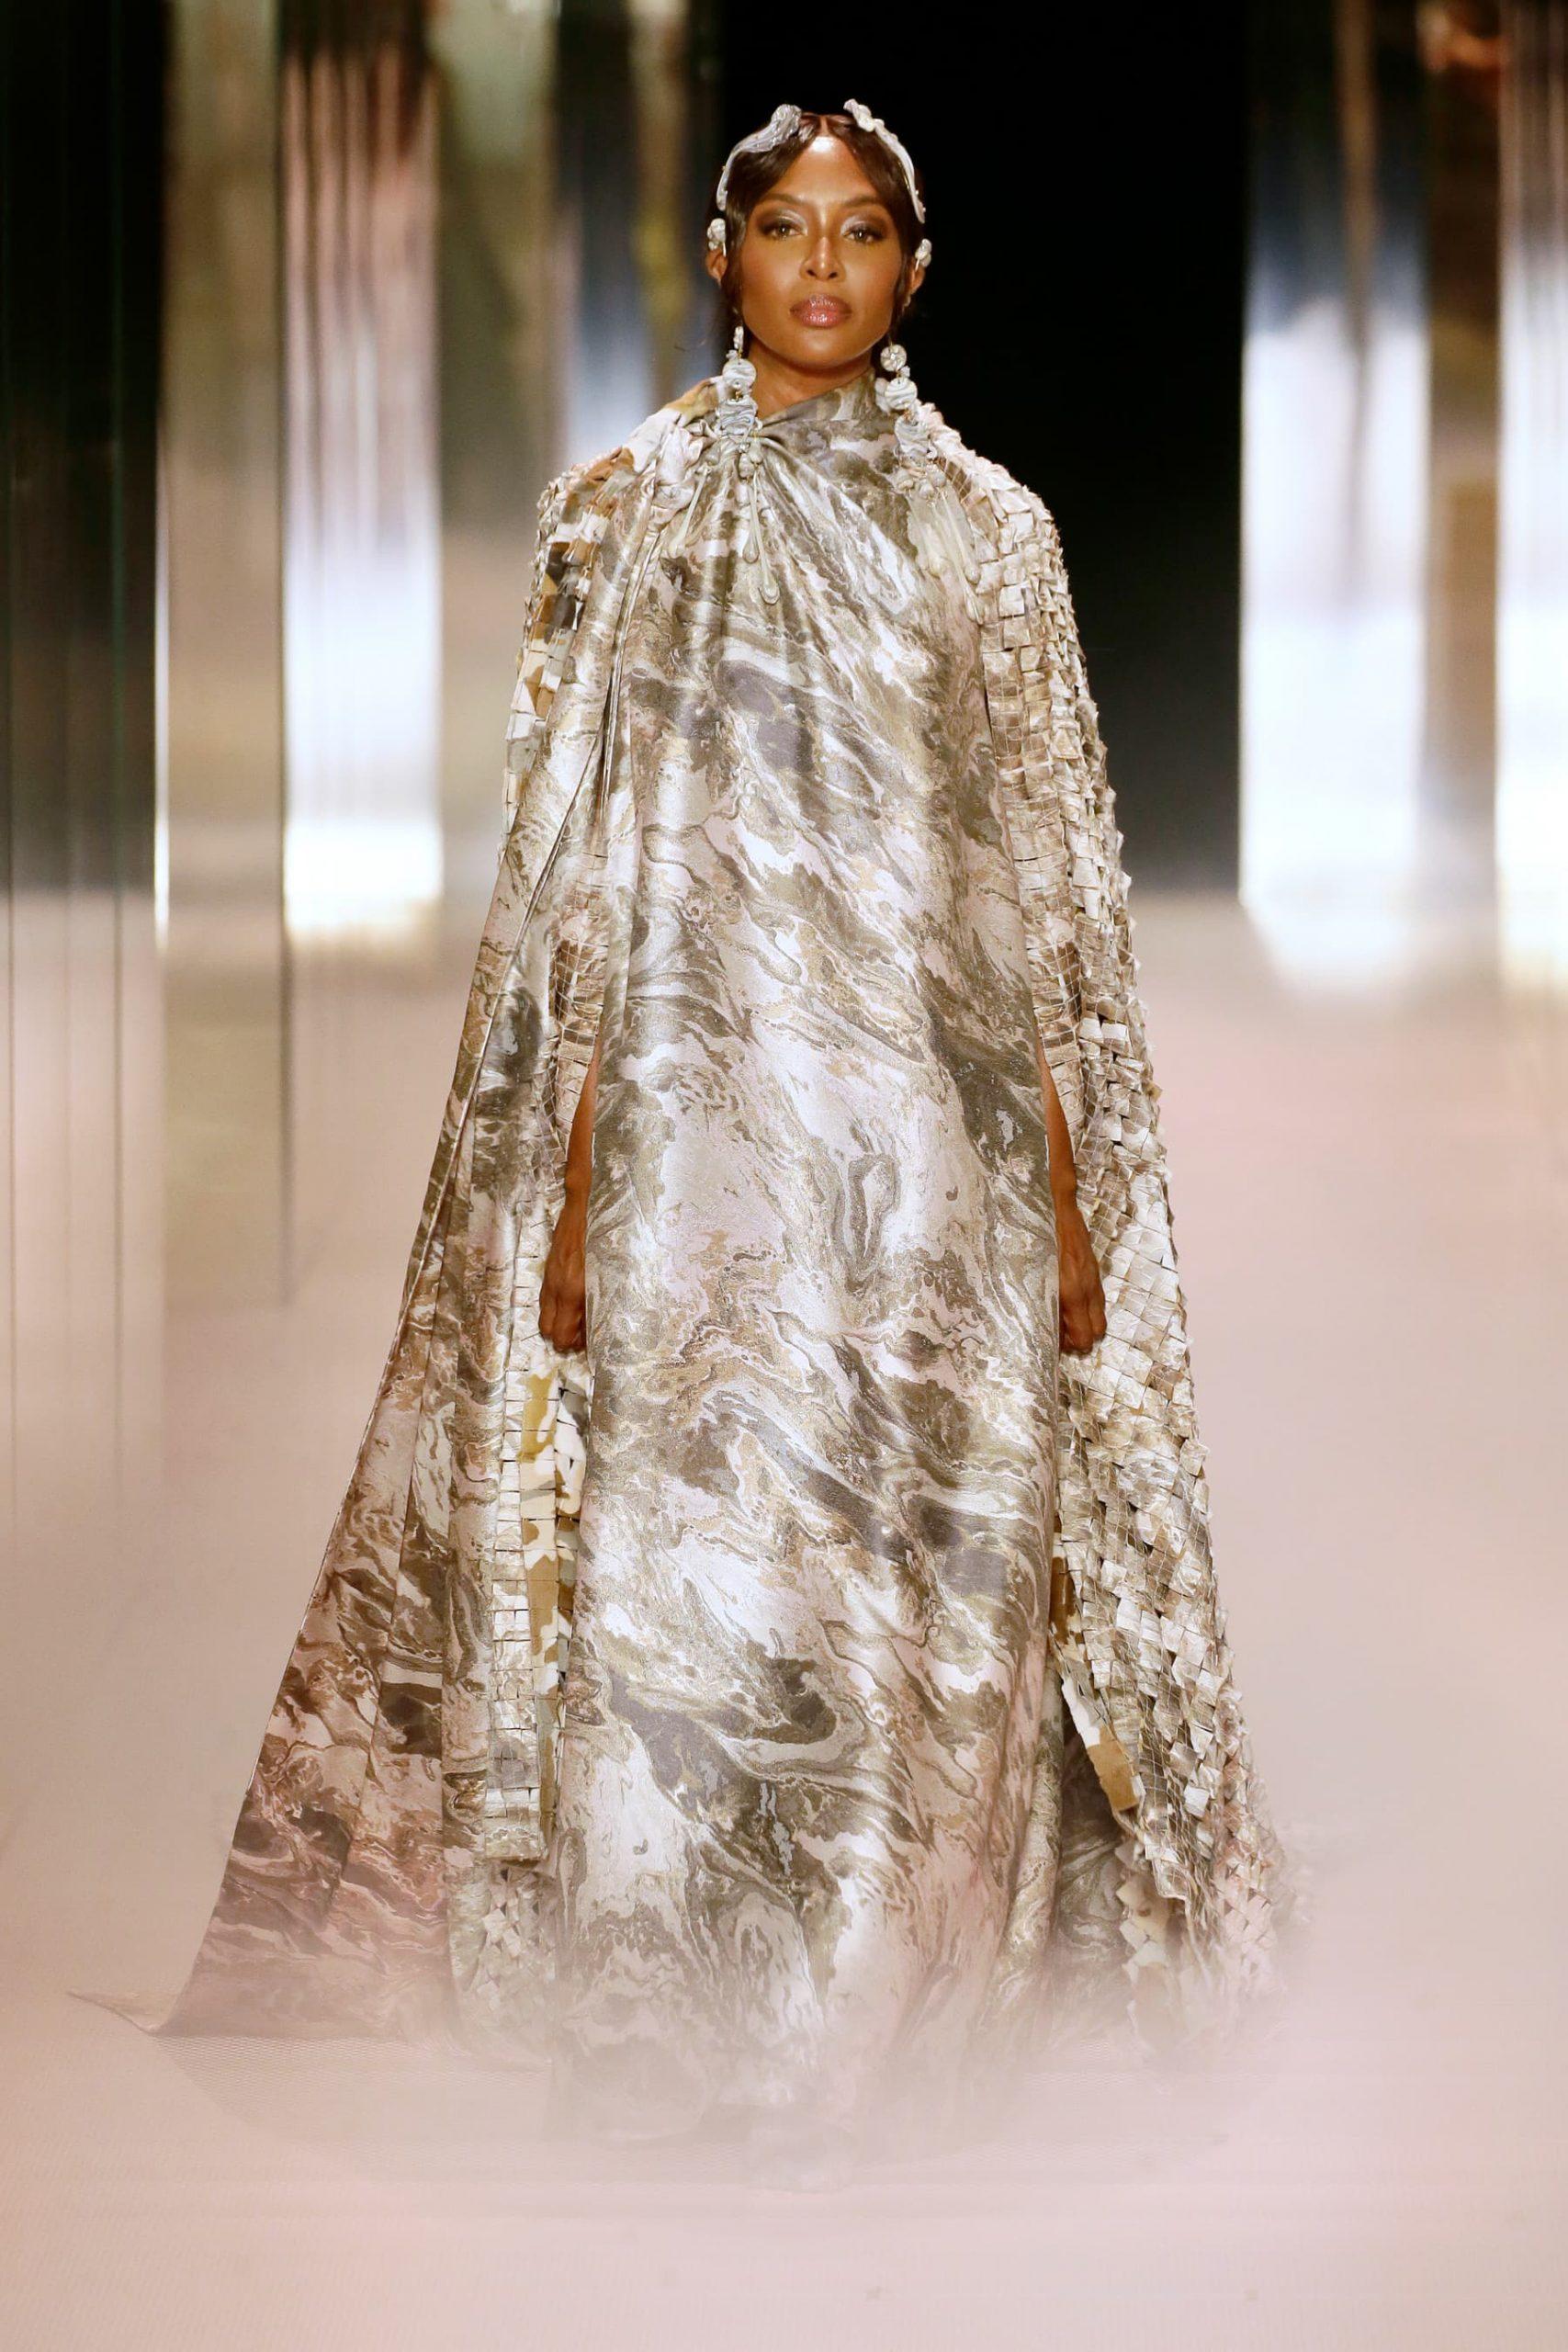 Fendi Spring 2021 Haute Couture Fashion Show Review